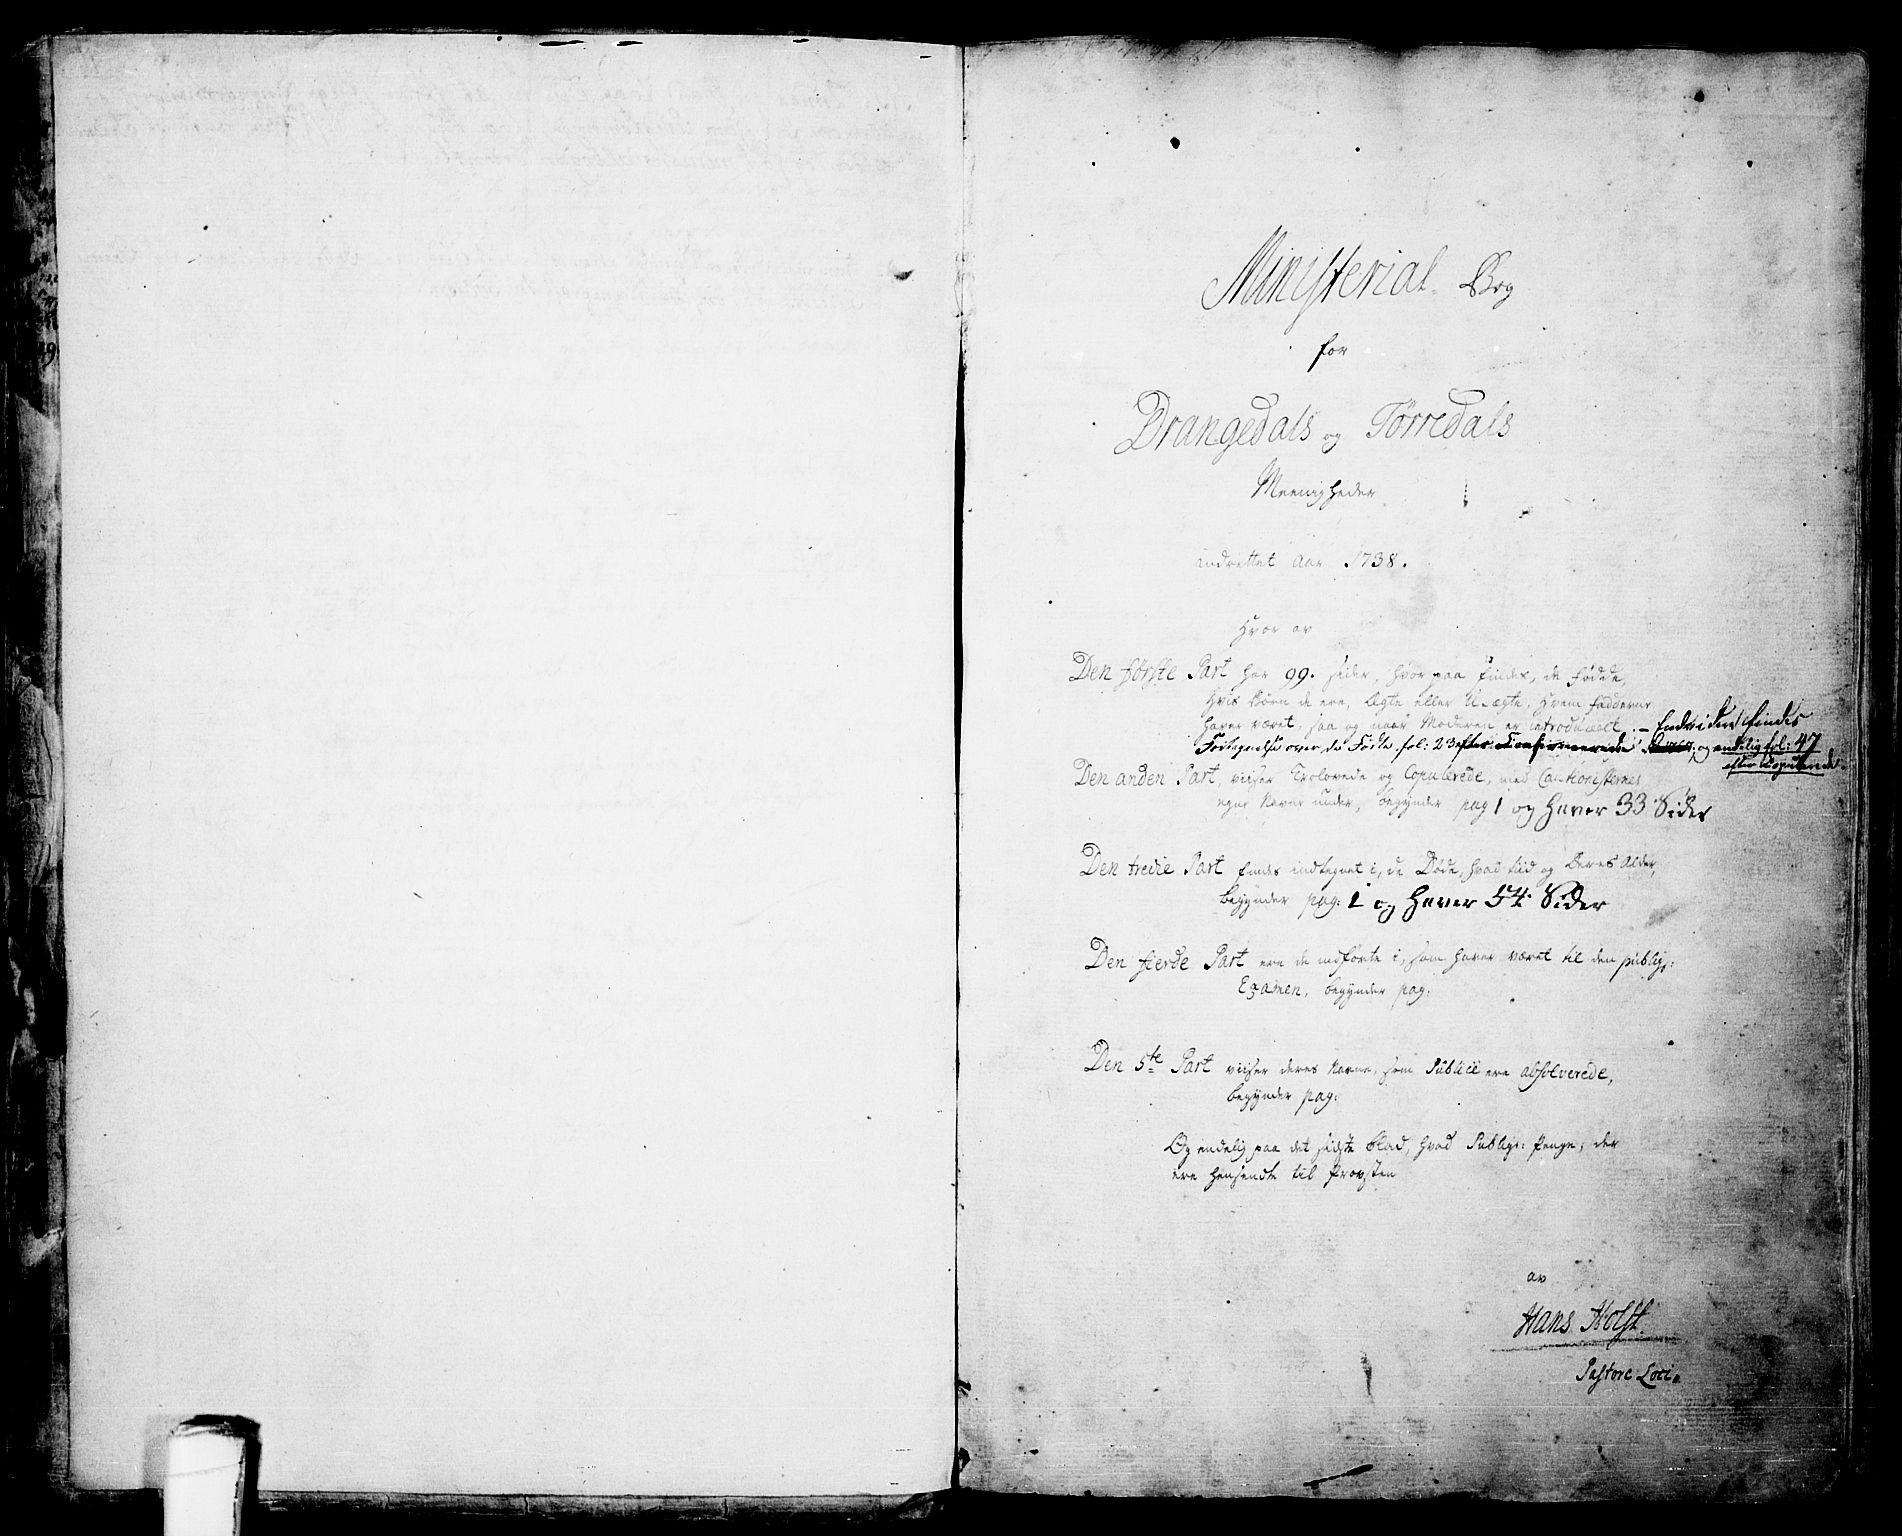 SAKO, Drangedal kirkebøker, F/Fa/L0001: Ministerialbok nr. 1, 1697-1767